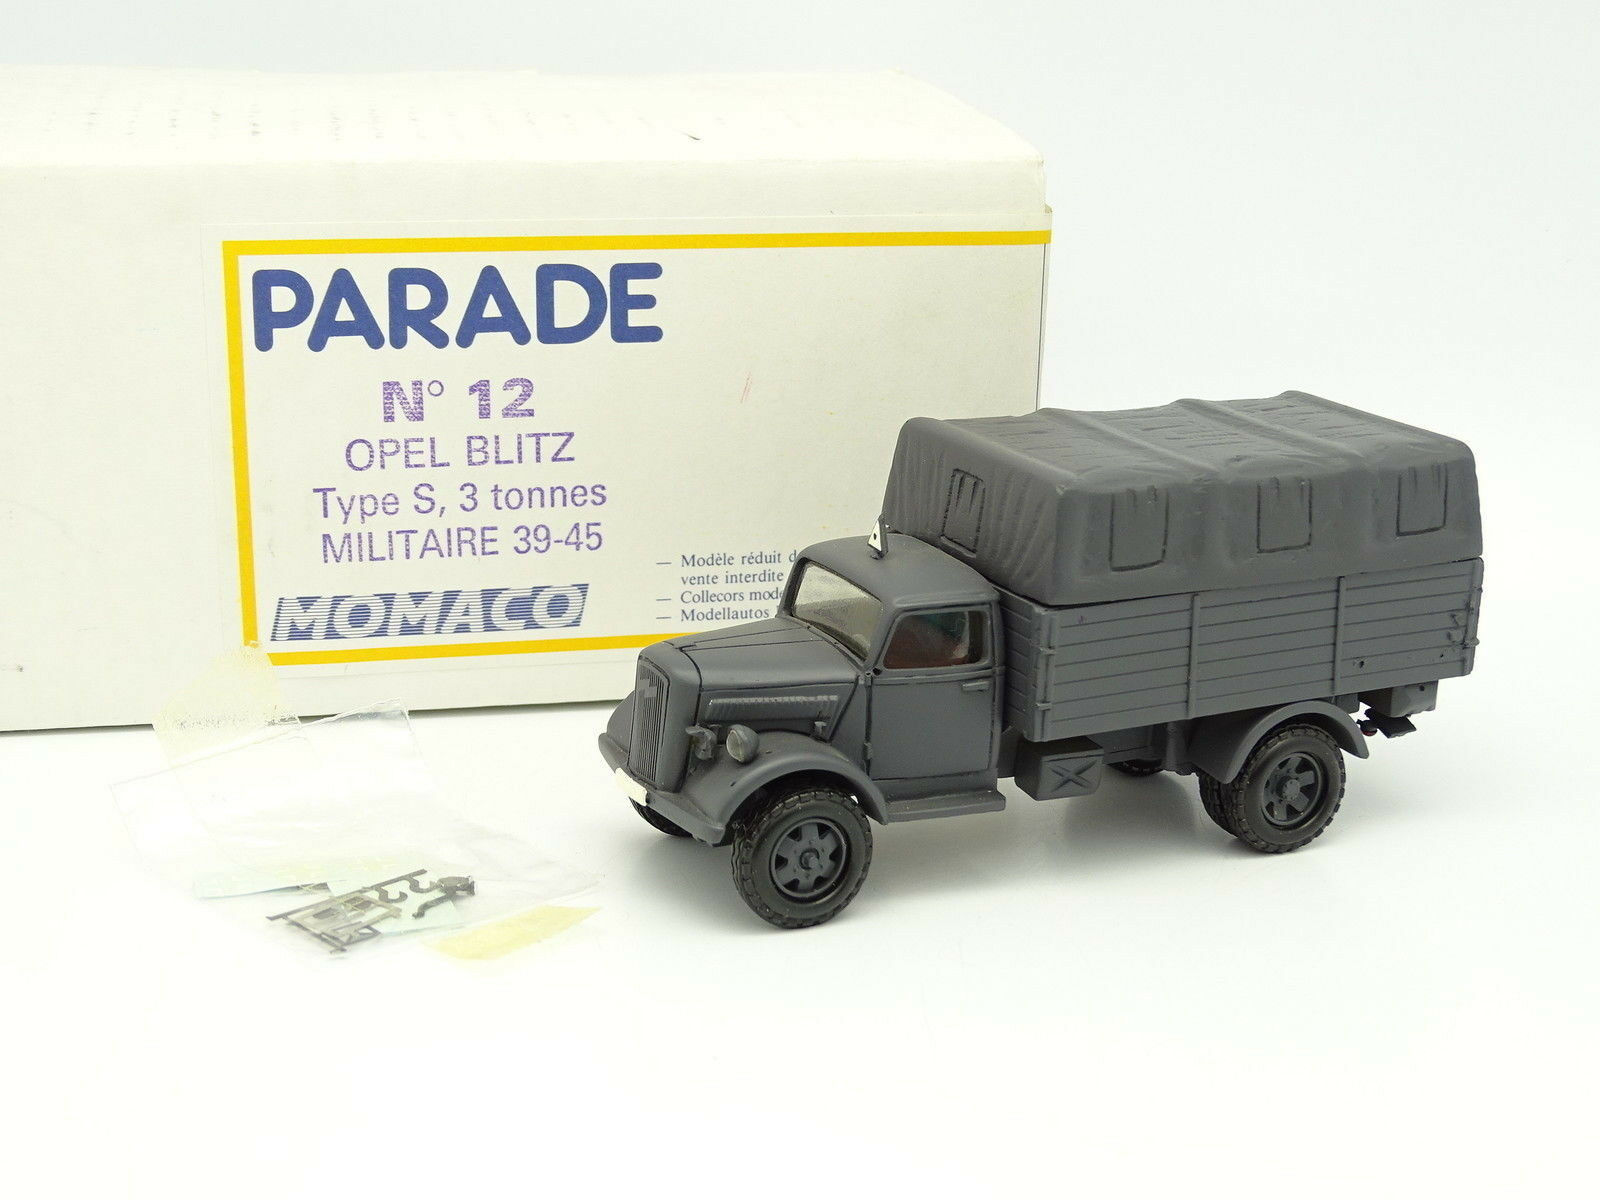 più sconto Parade Parade Parade Militaire Armée 1 50 - Opel Blitz Type S 3T 39-45  in vendita online